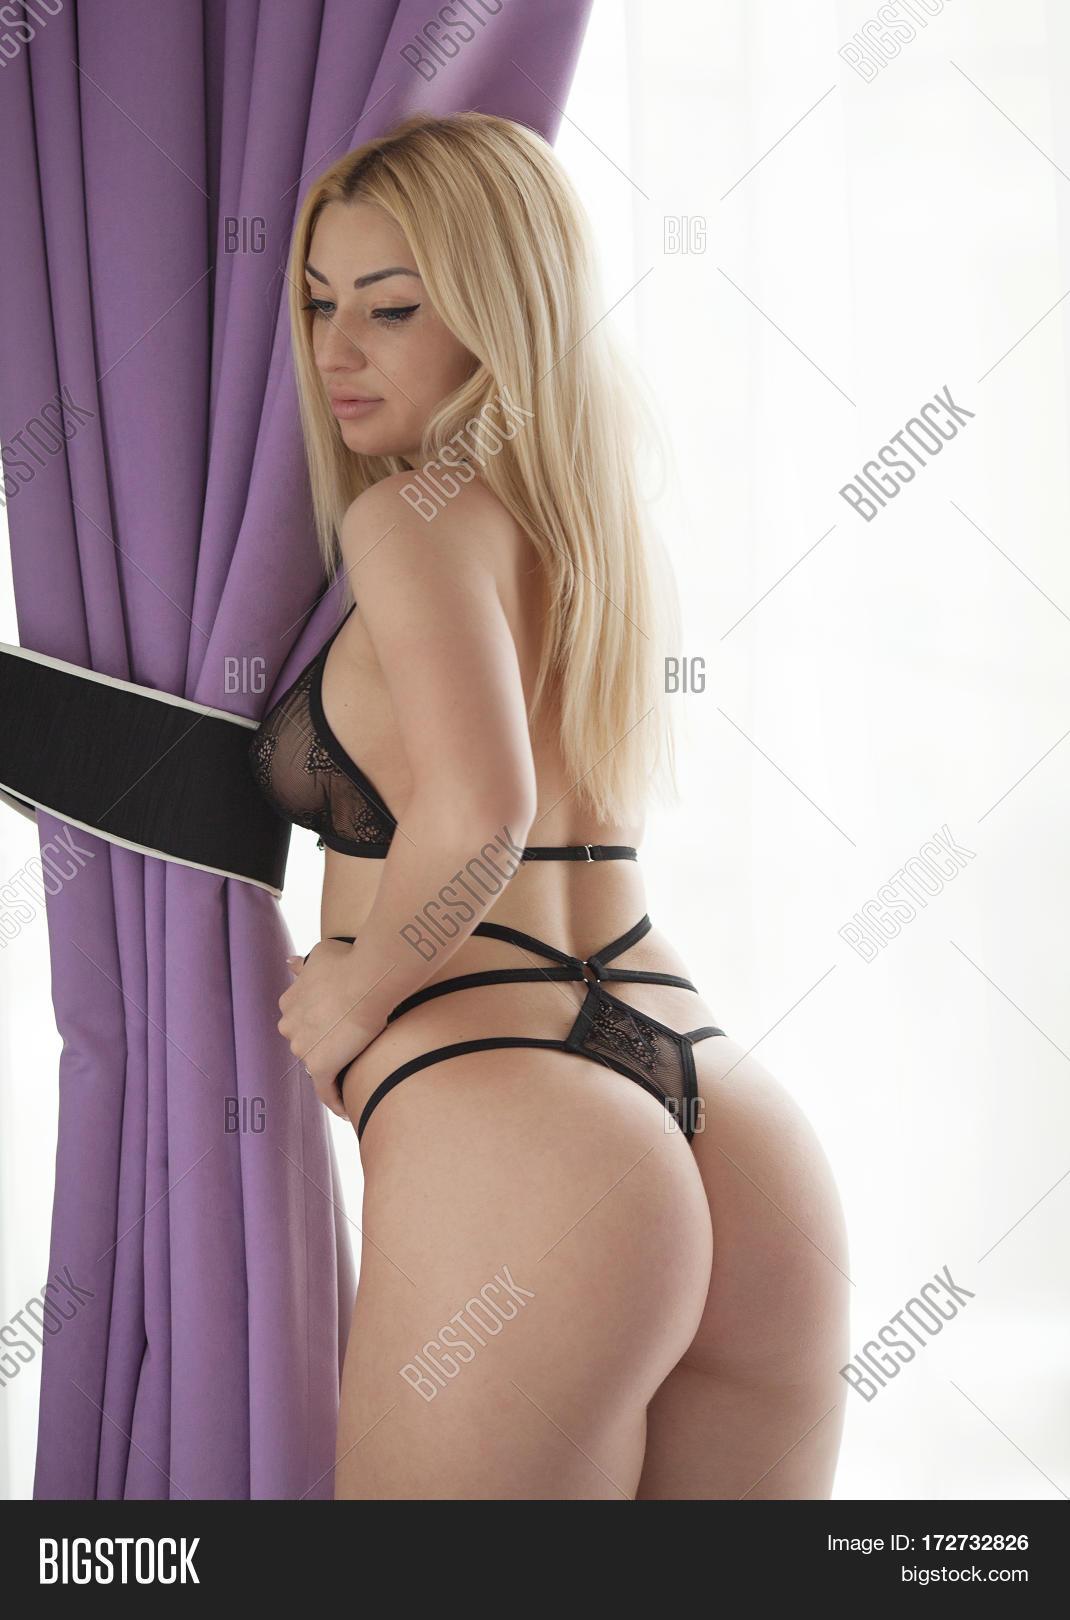 Bdsm woman panties butt